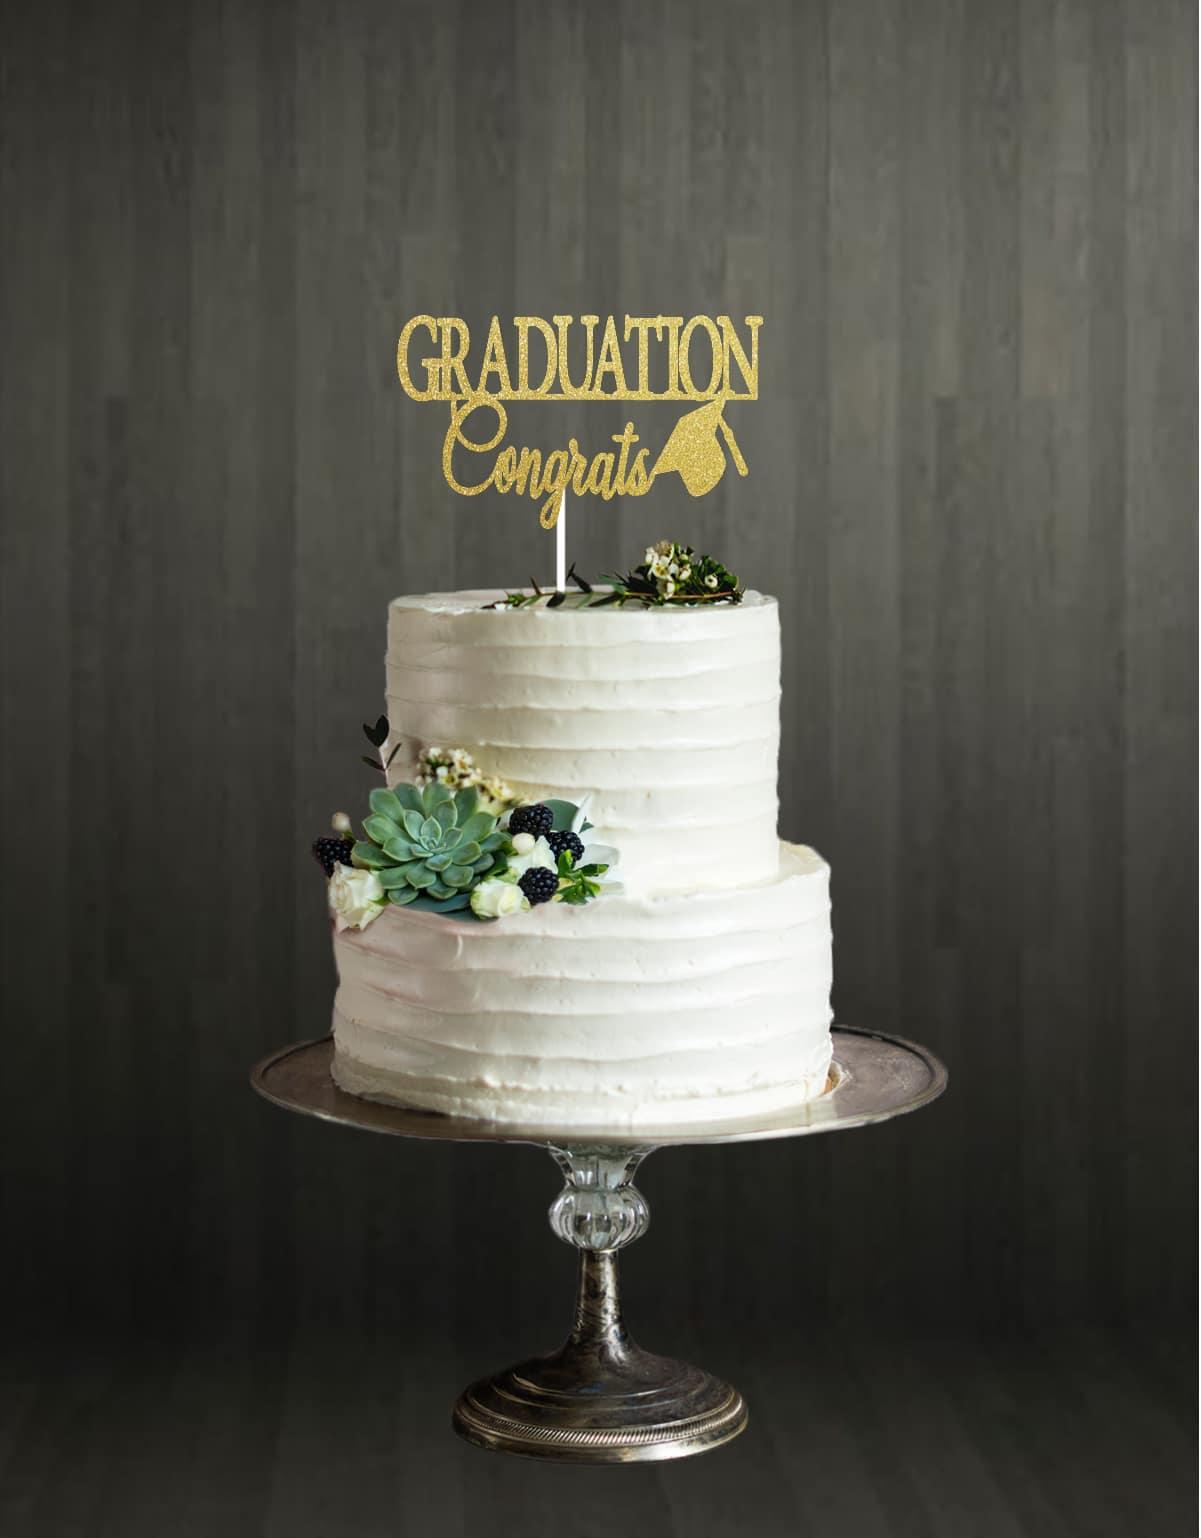 Graduation Congrats Glitter Cake Topper Cake Topper Cake Art Creations